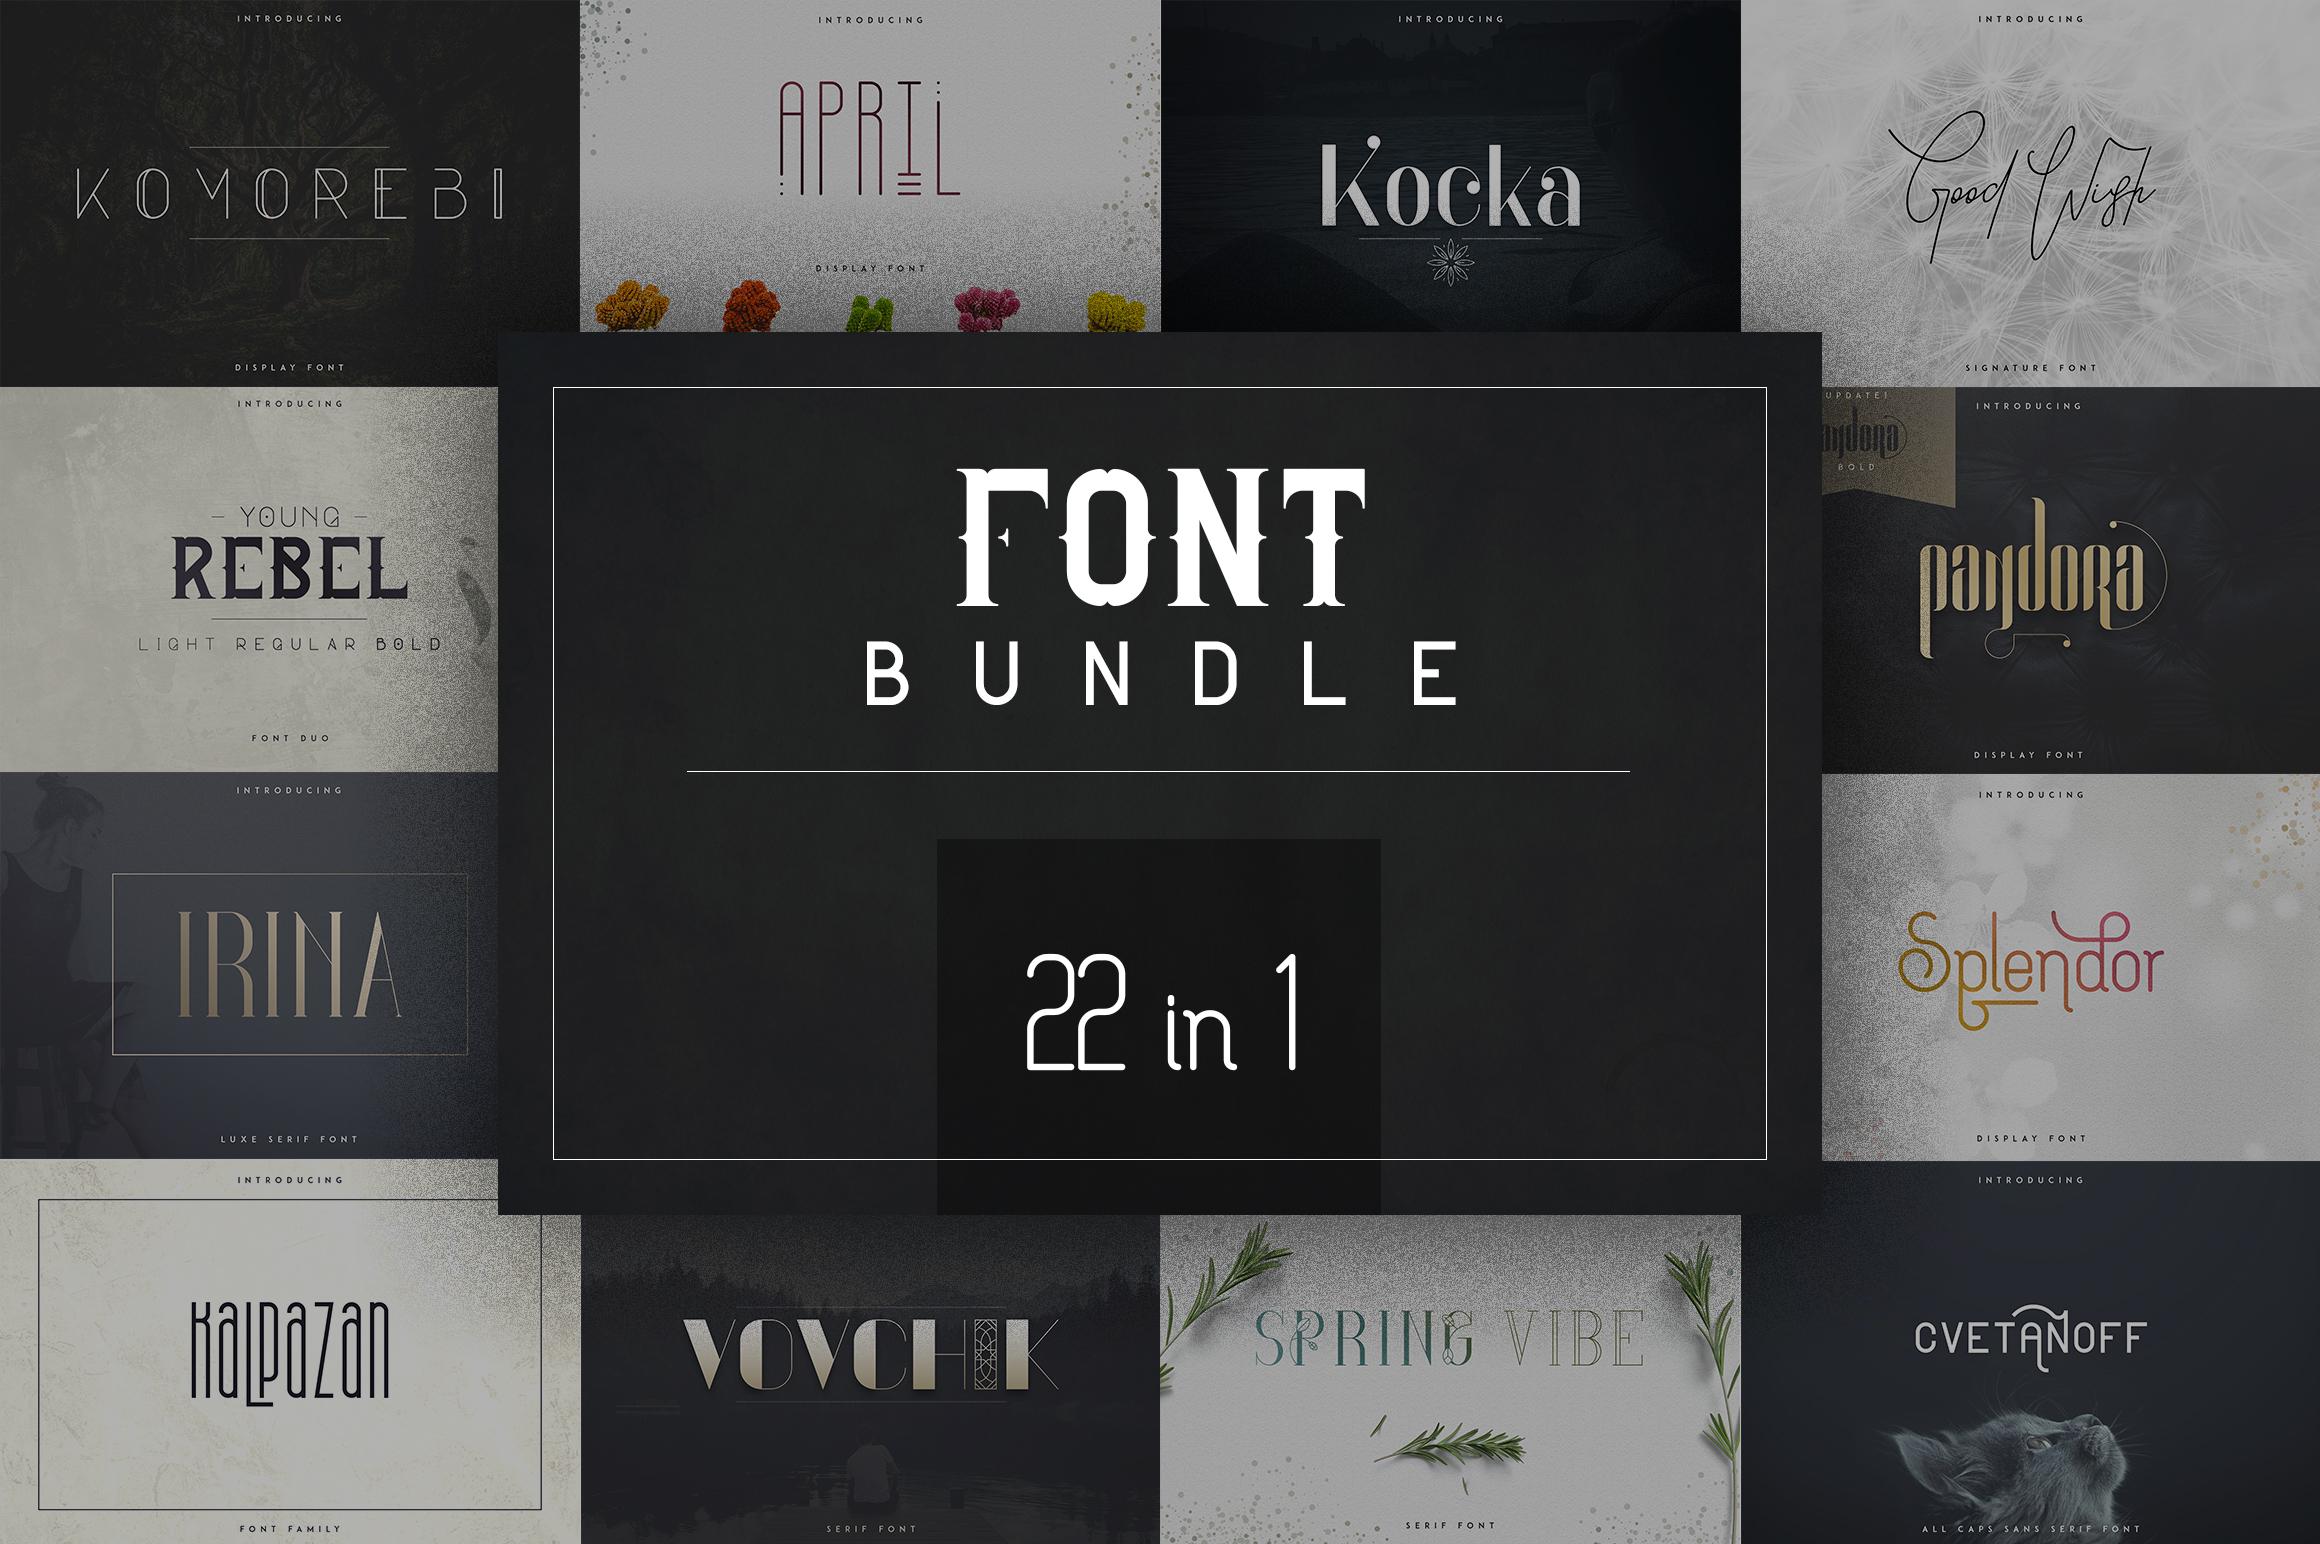 22in1 Legendary Font Bundle example image 1